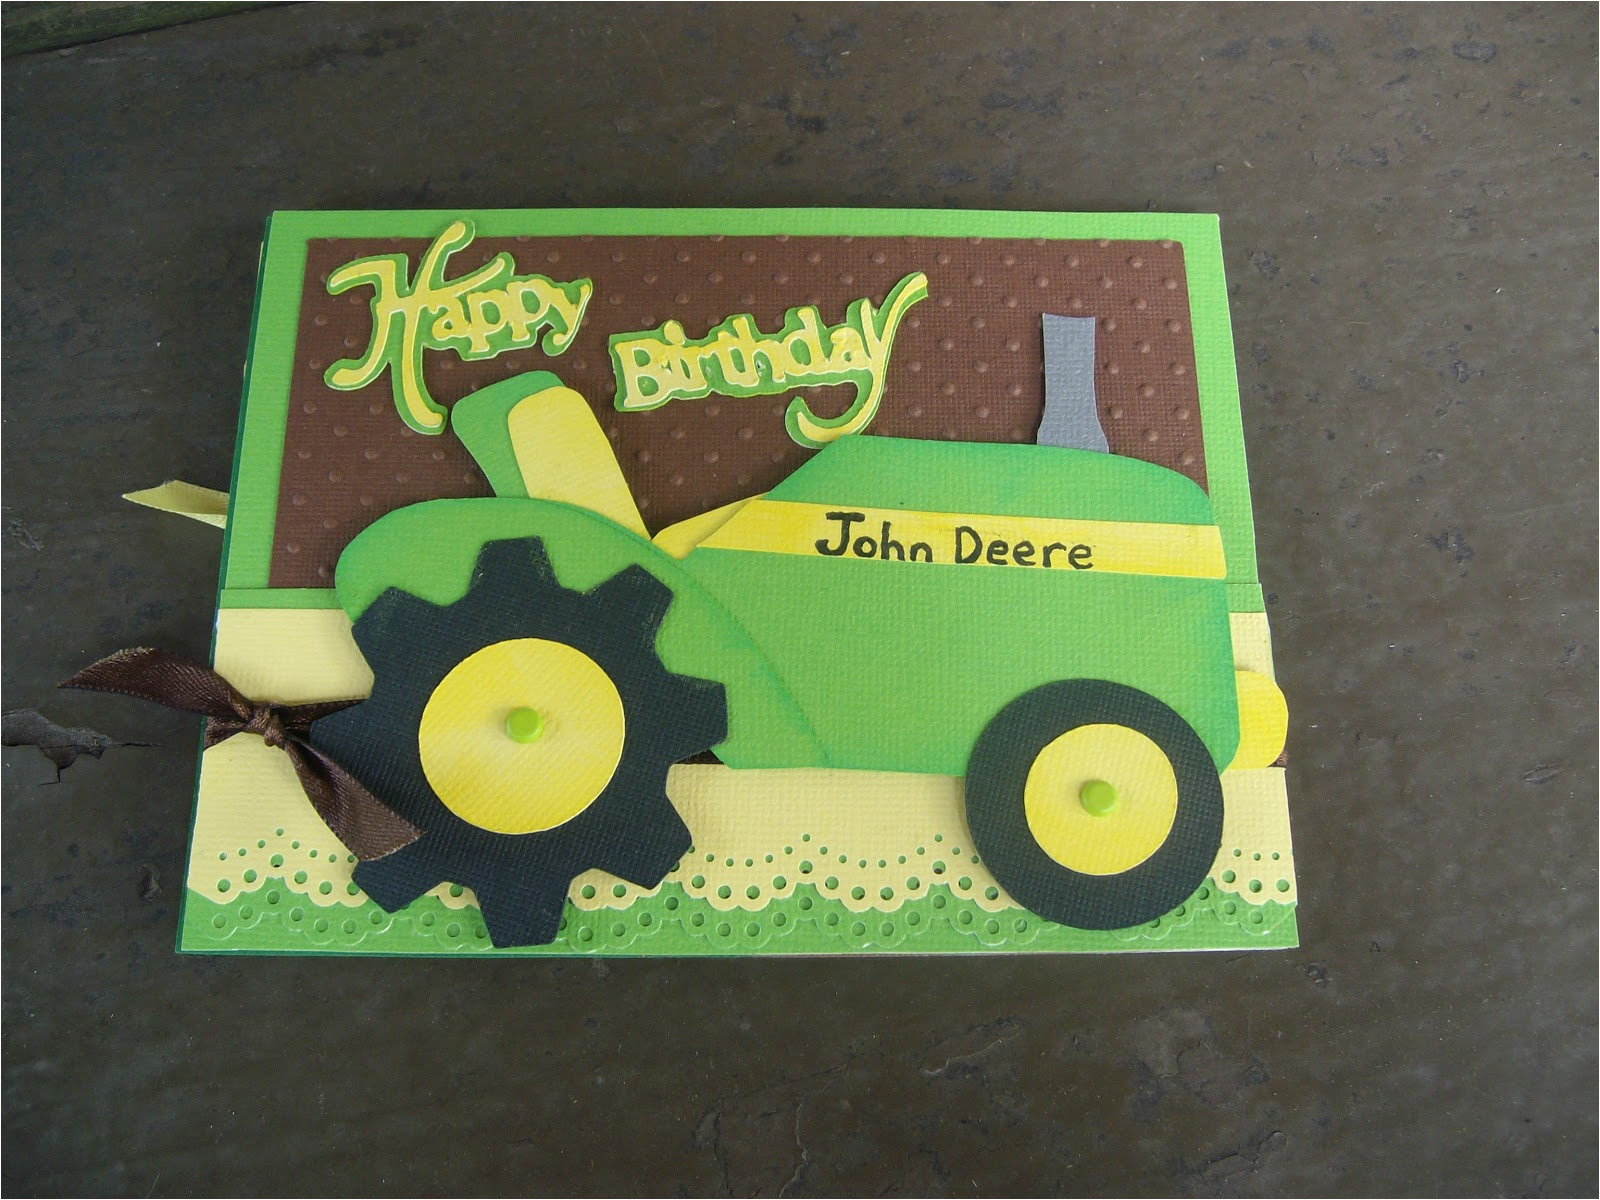 faith by heavenly designs john deere happy birthday card